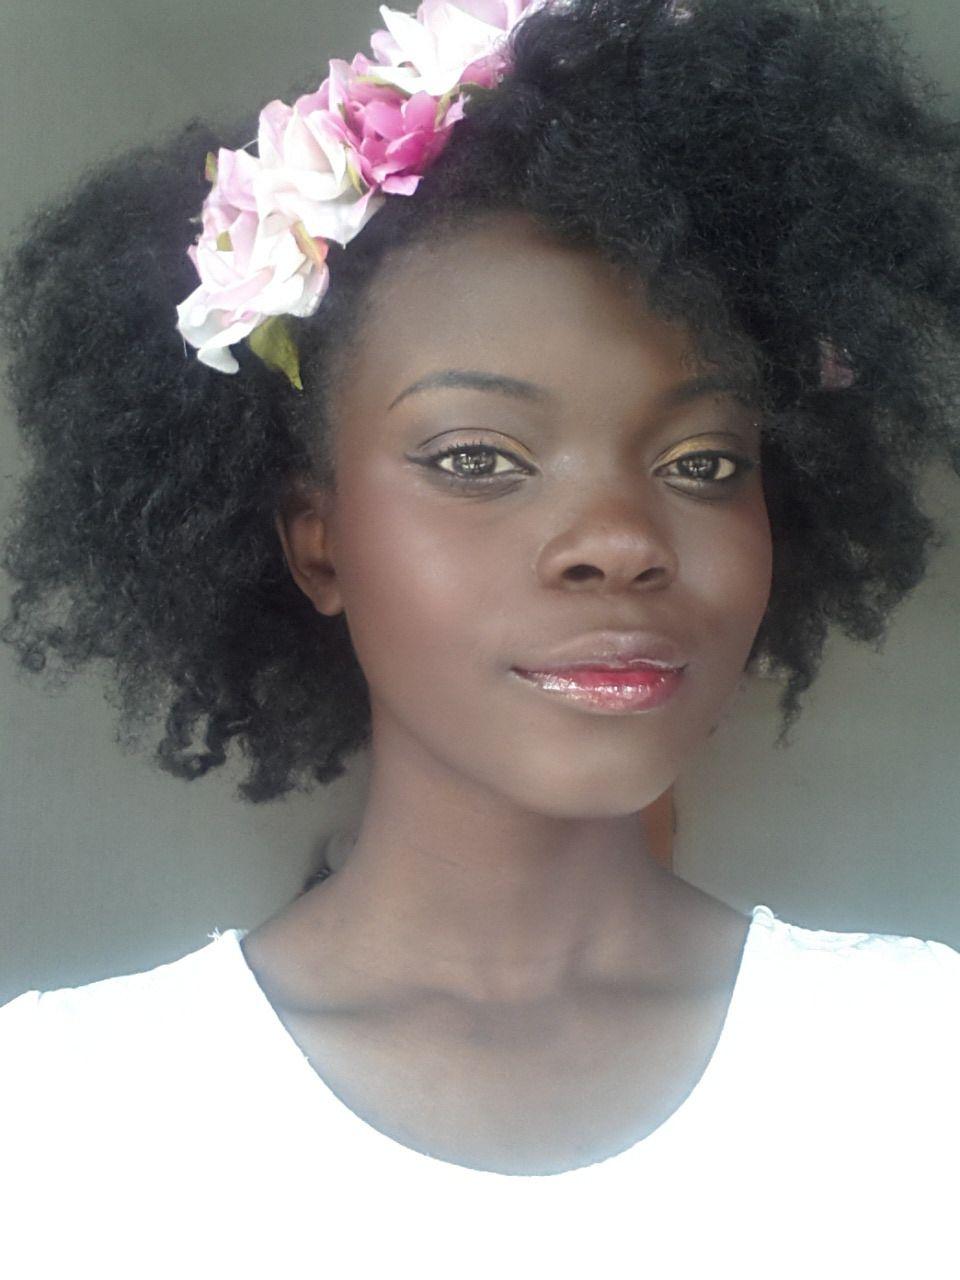 sirius soulstar inspirashun more naturally beautiful curls afro and flowers flower crowns izmirmasajfo